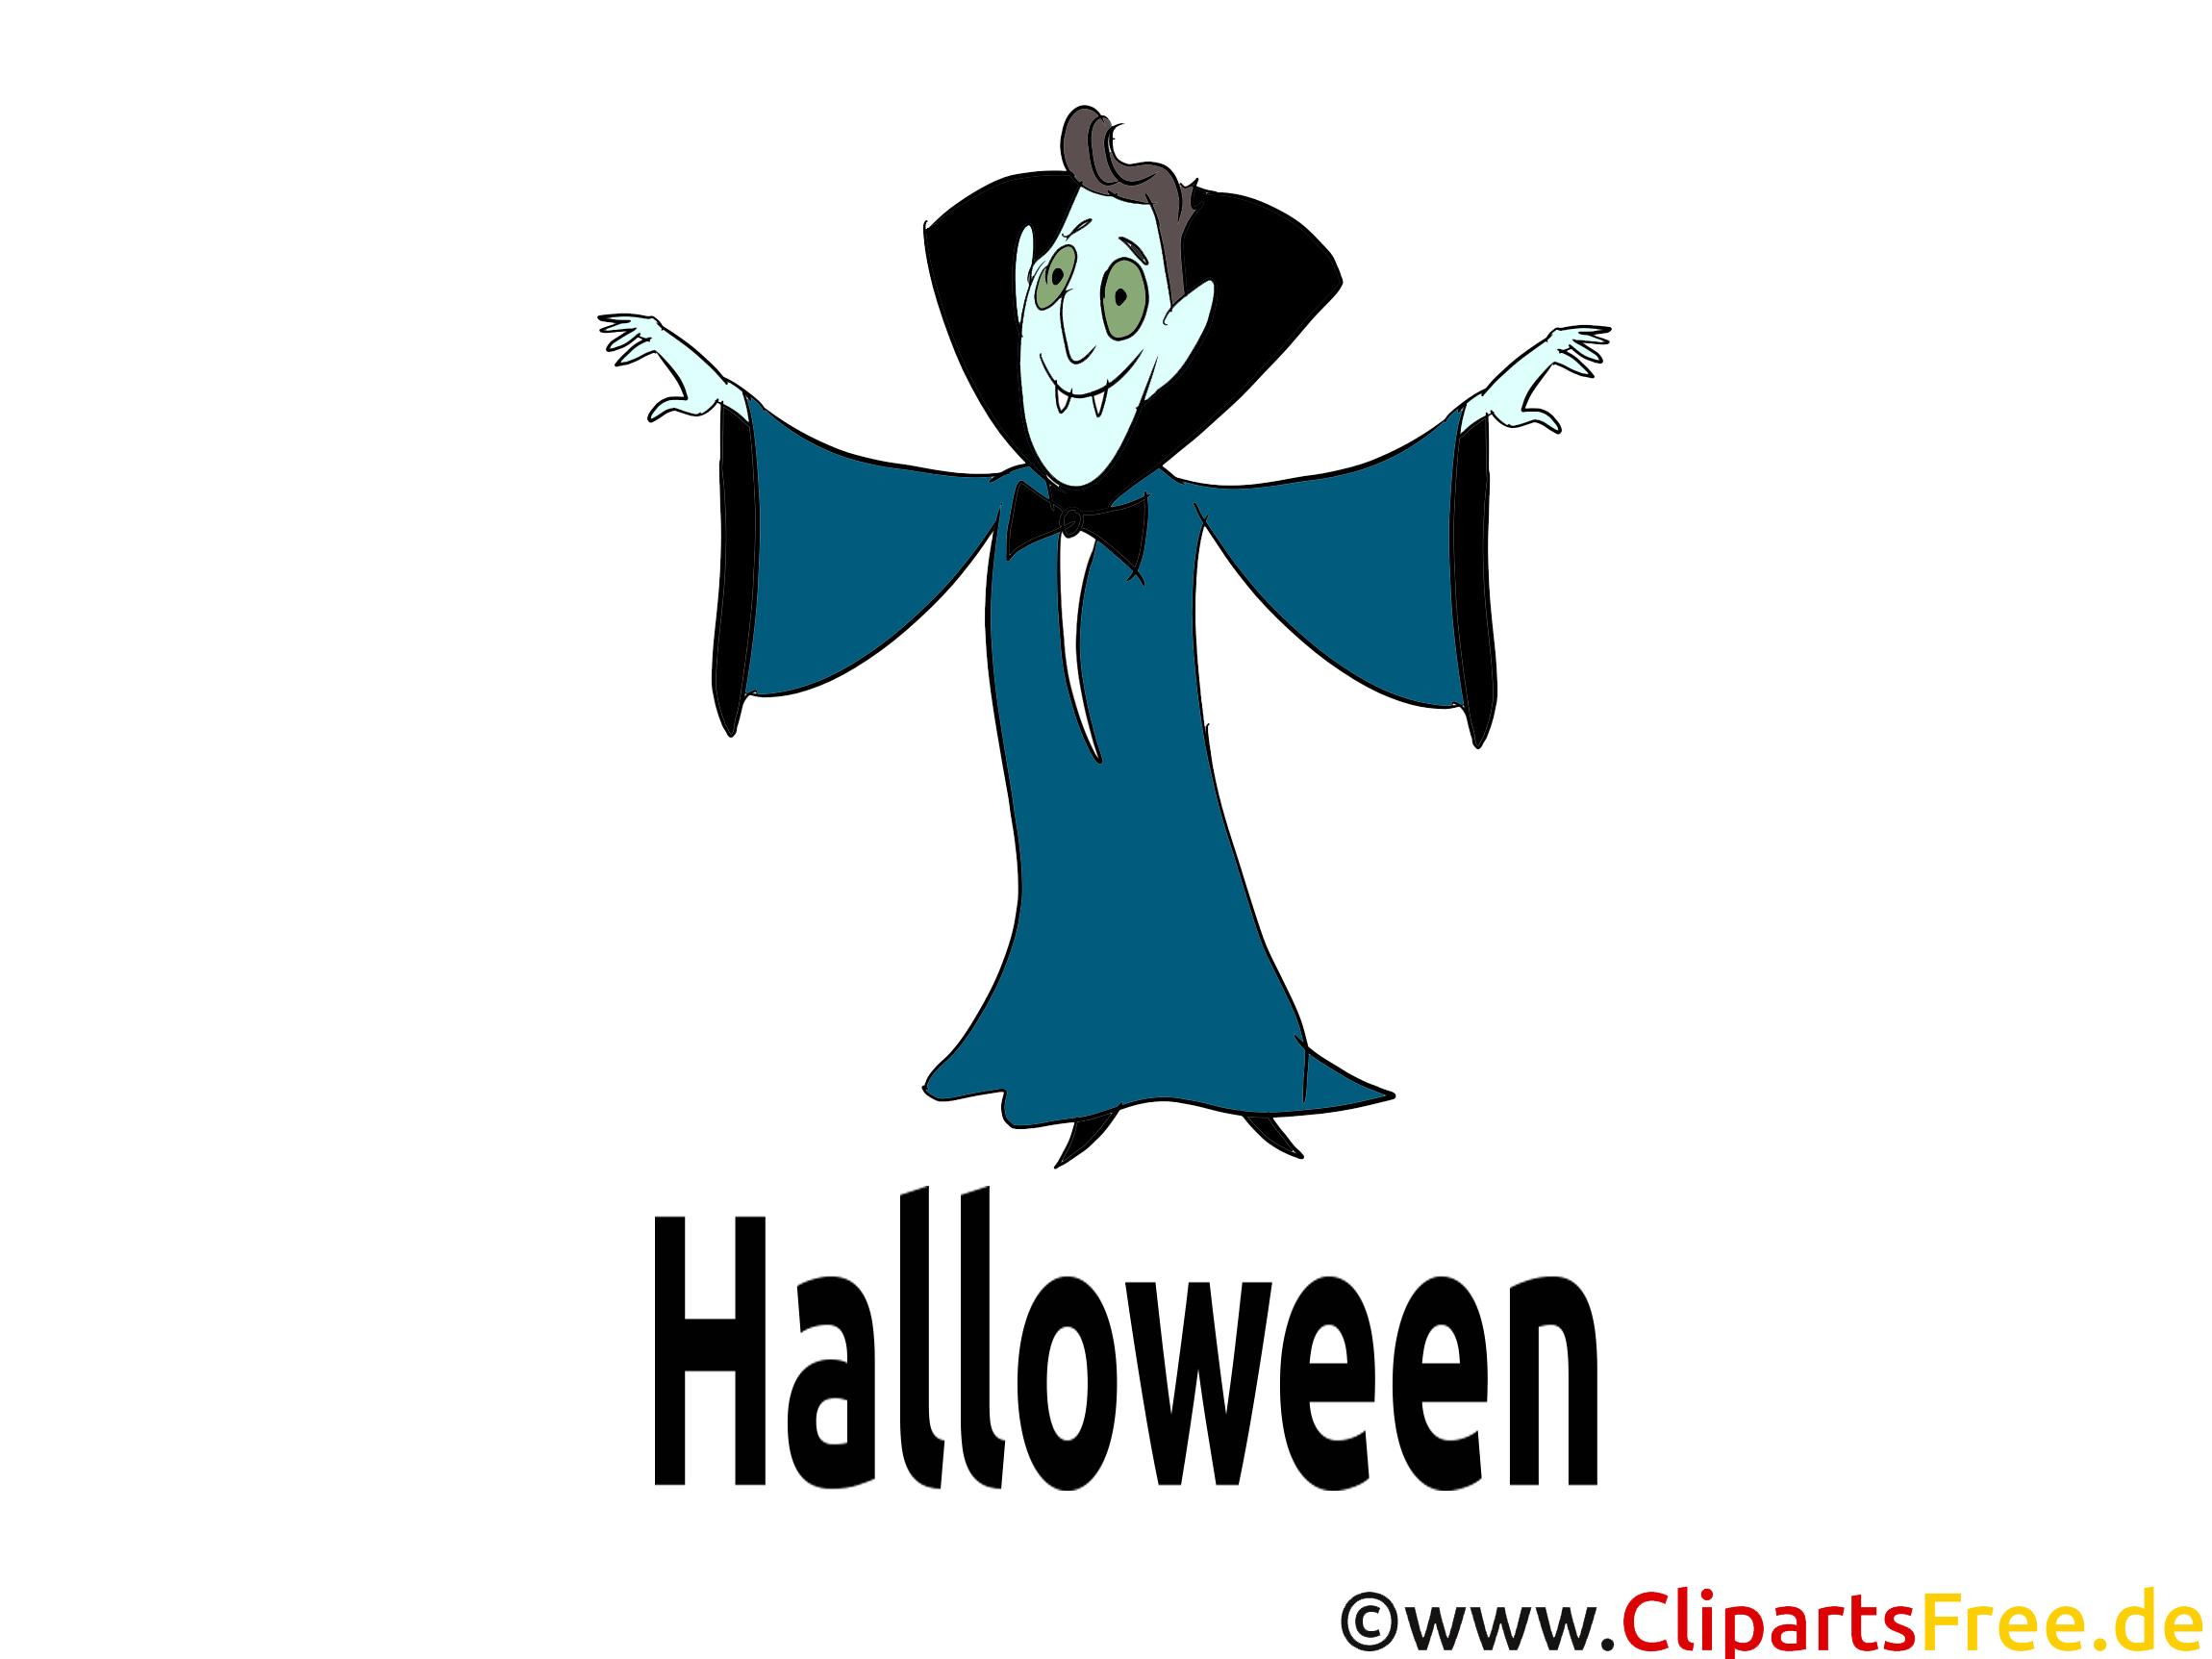 clipart kostenlos halloween - photo #25